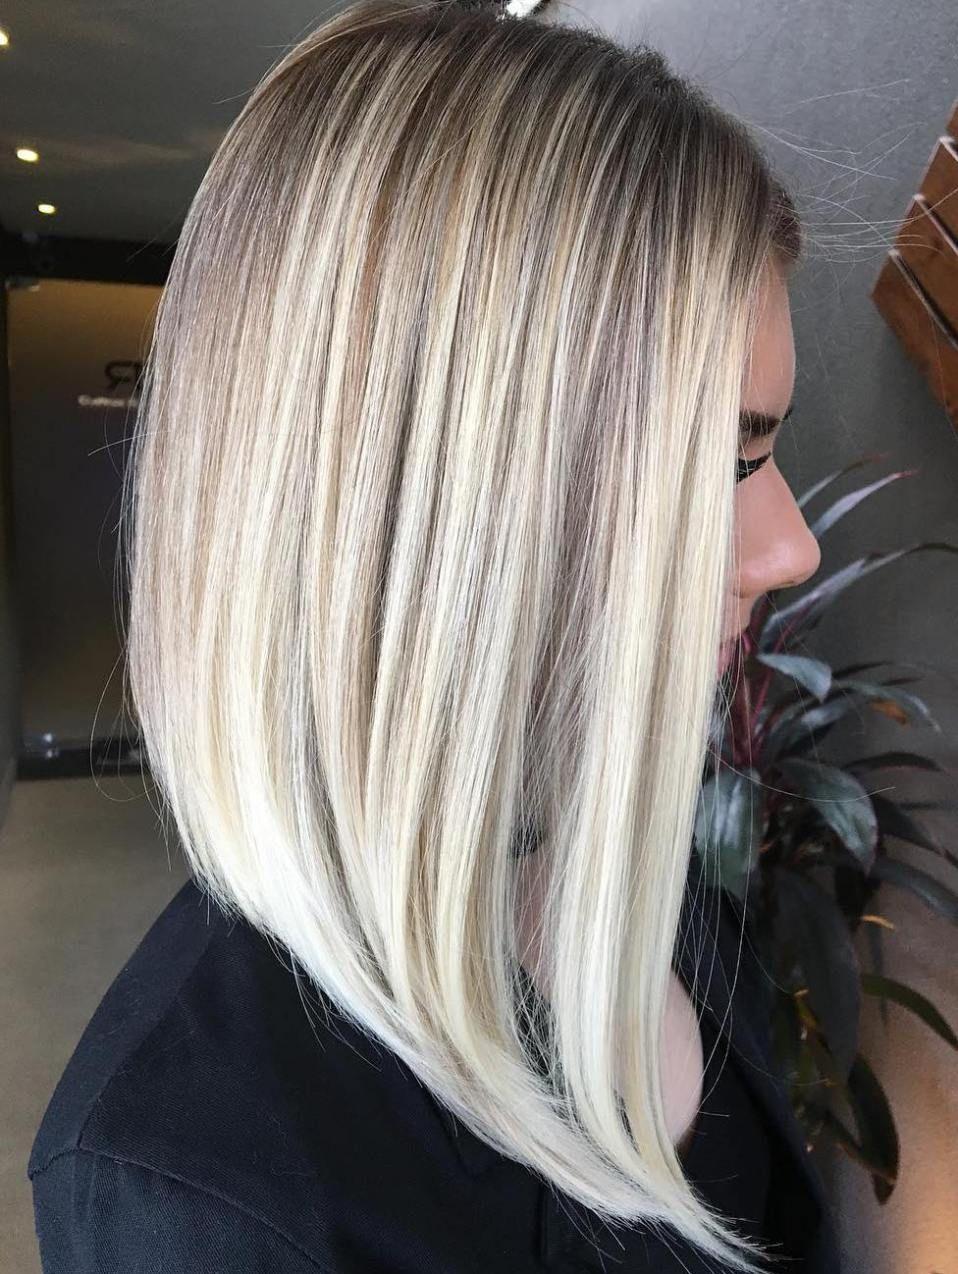 60 Fun and Flattering Medium Hairstyles for Women | Blonde balayage ...